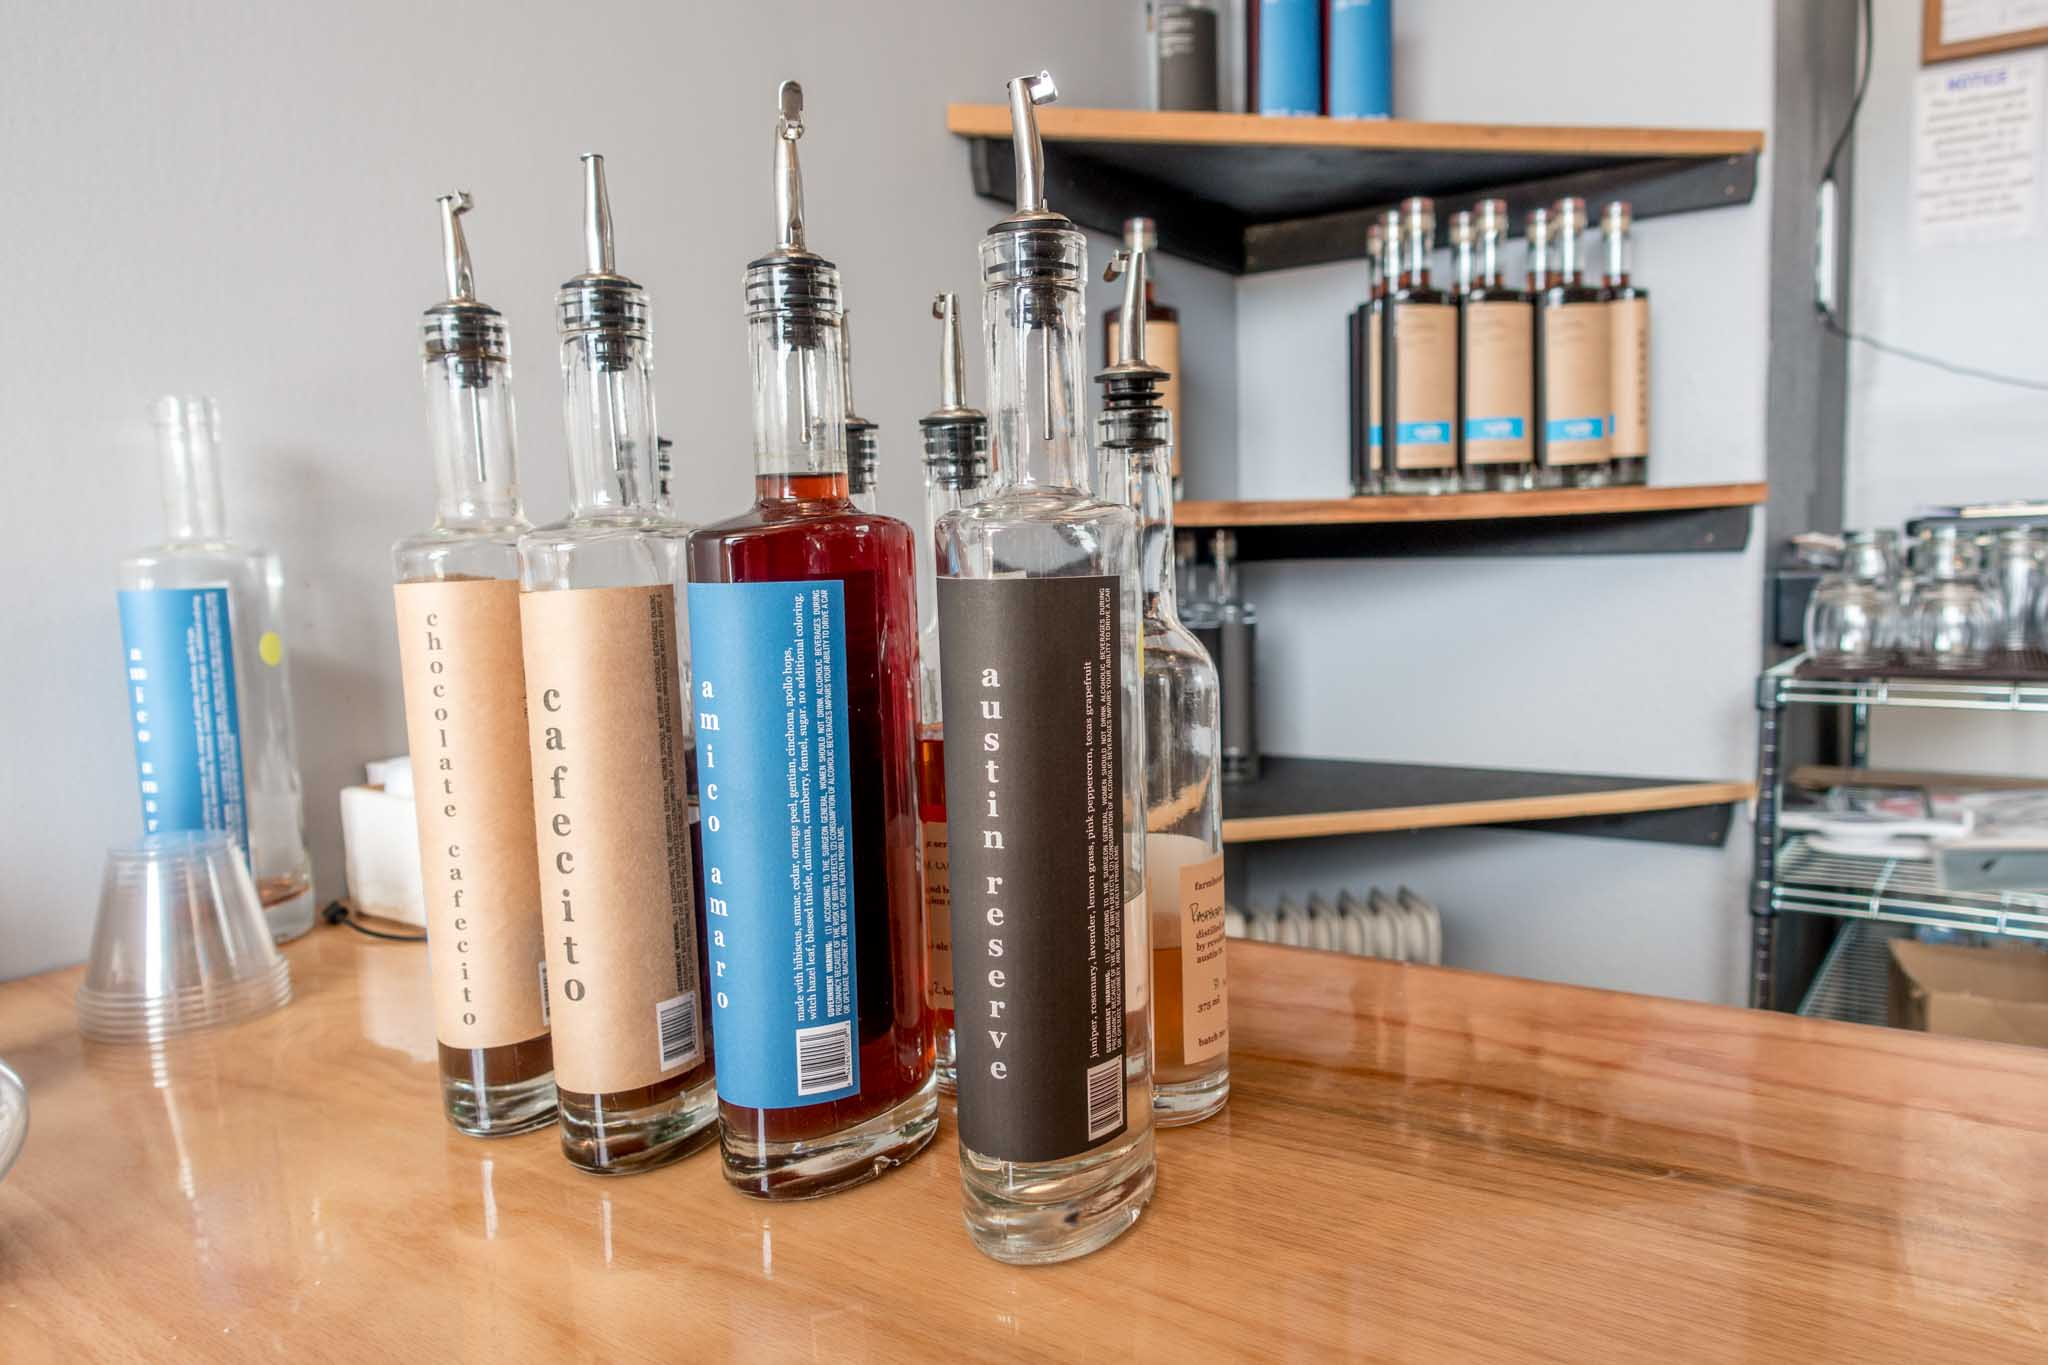 Revolution Spirits' gins and liqueur bottles on bar